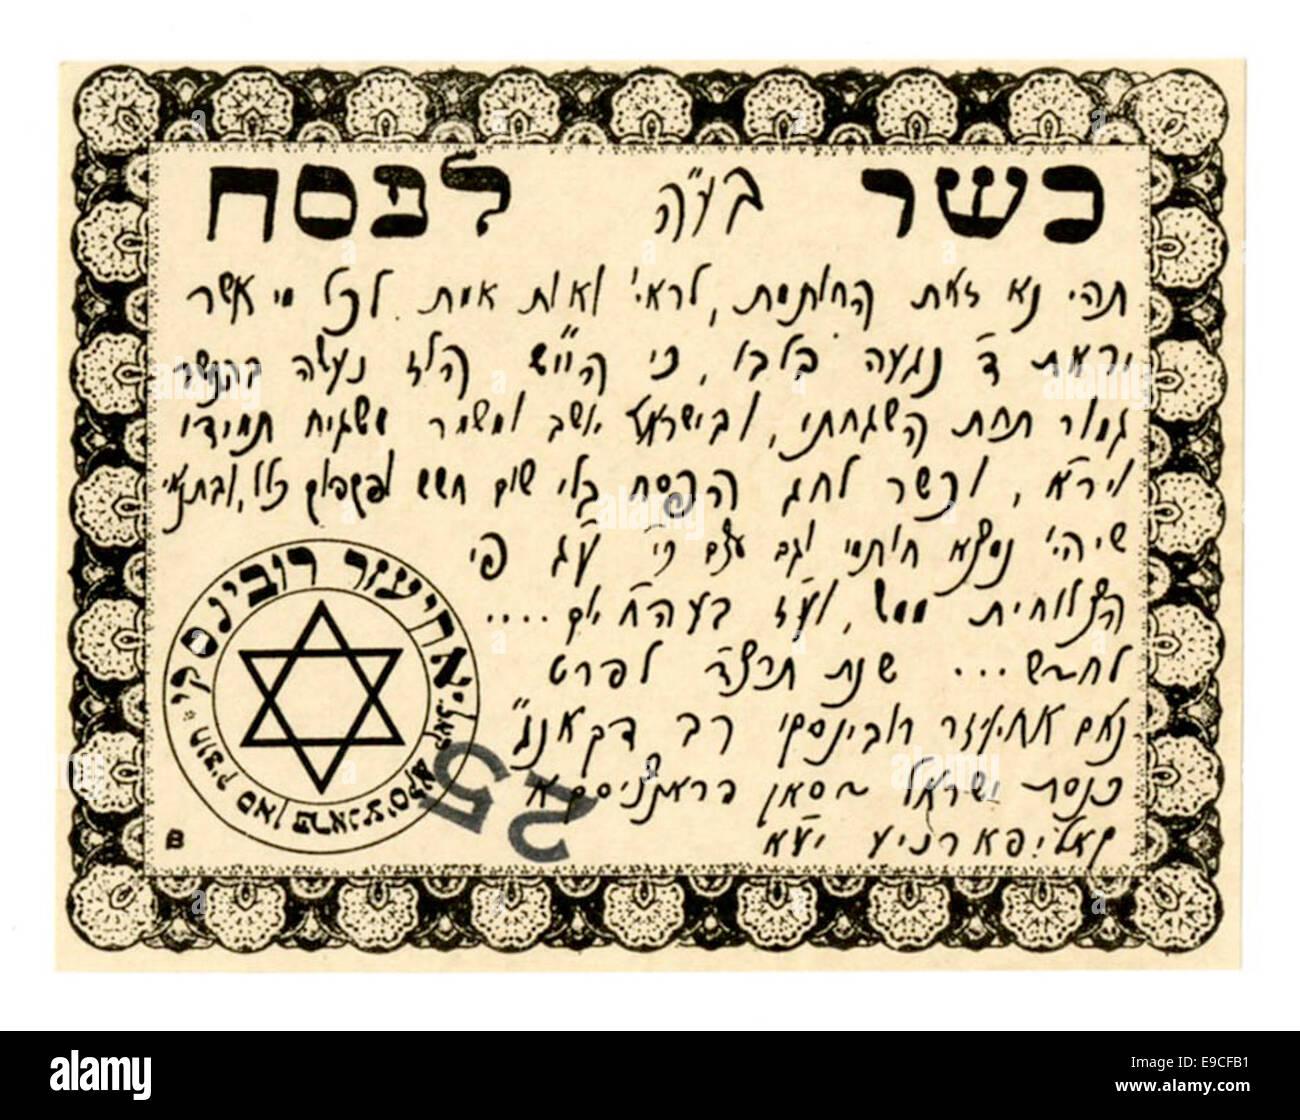 Wine label in Hebrew - Stock Image